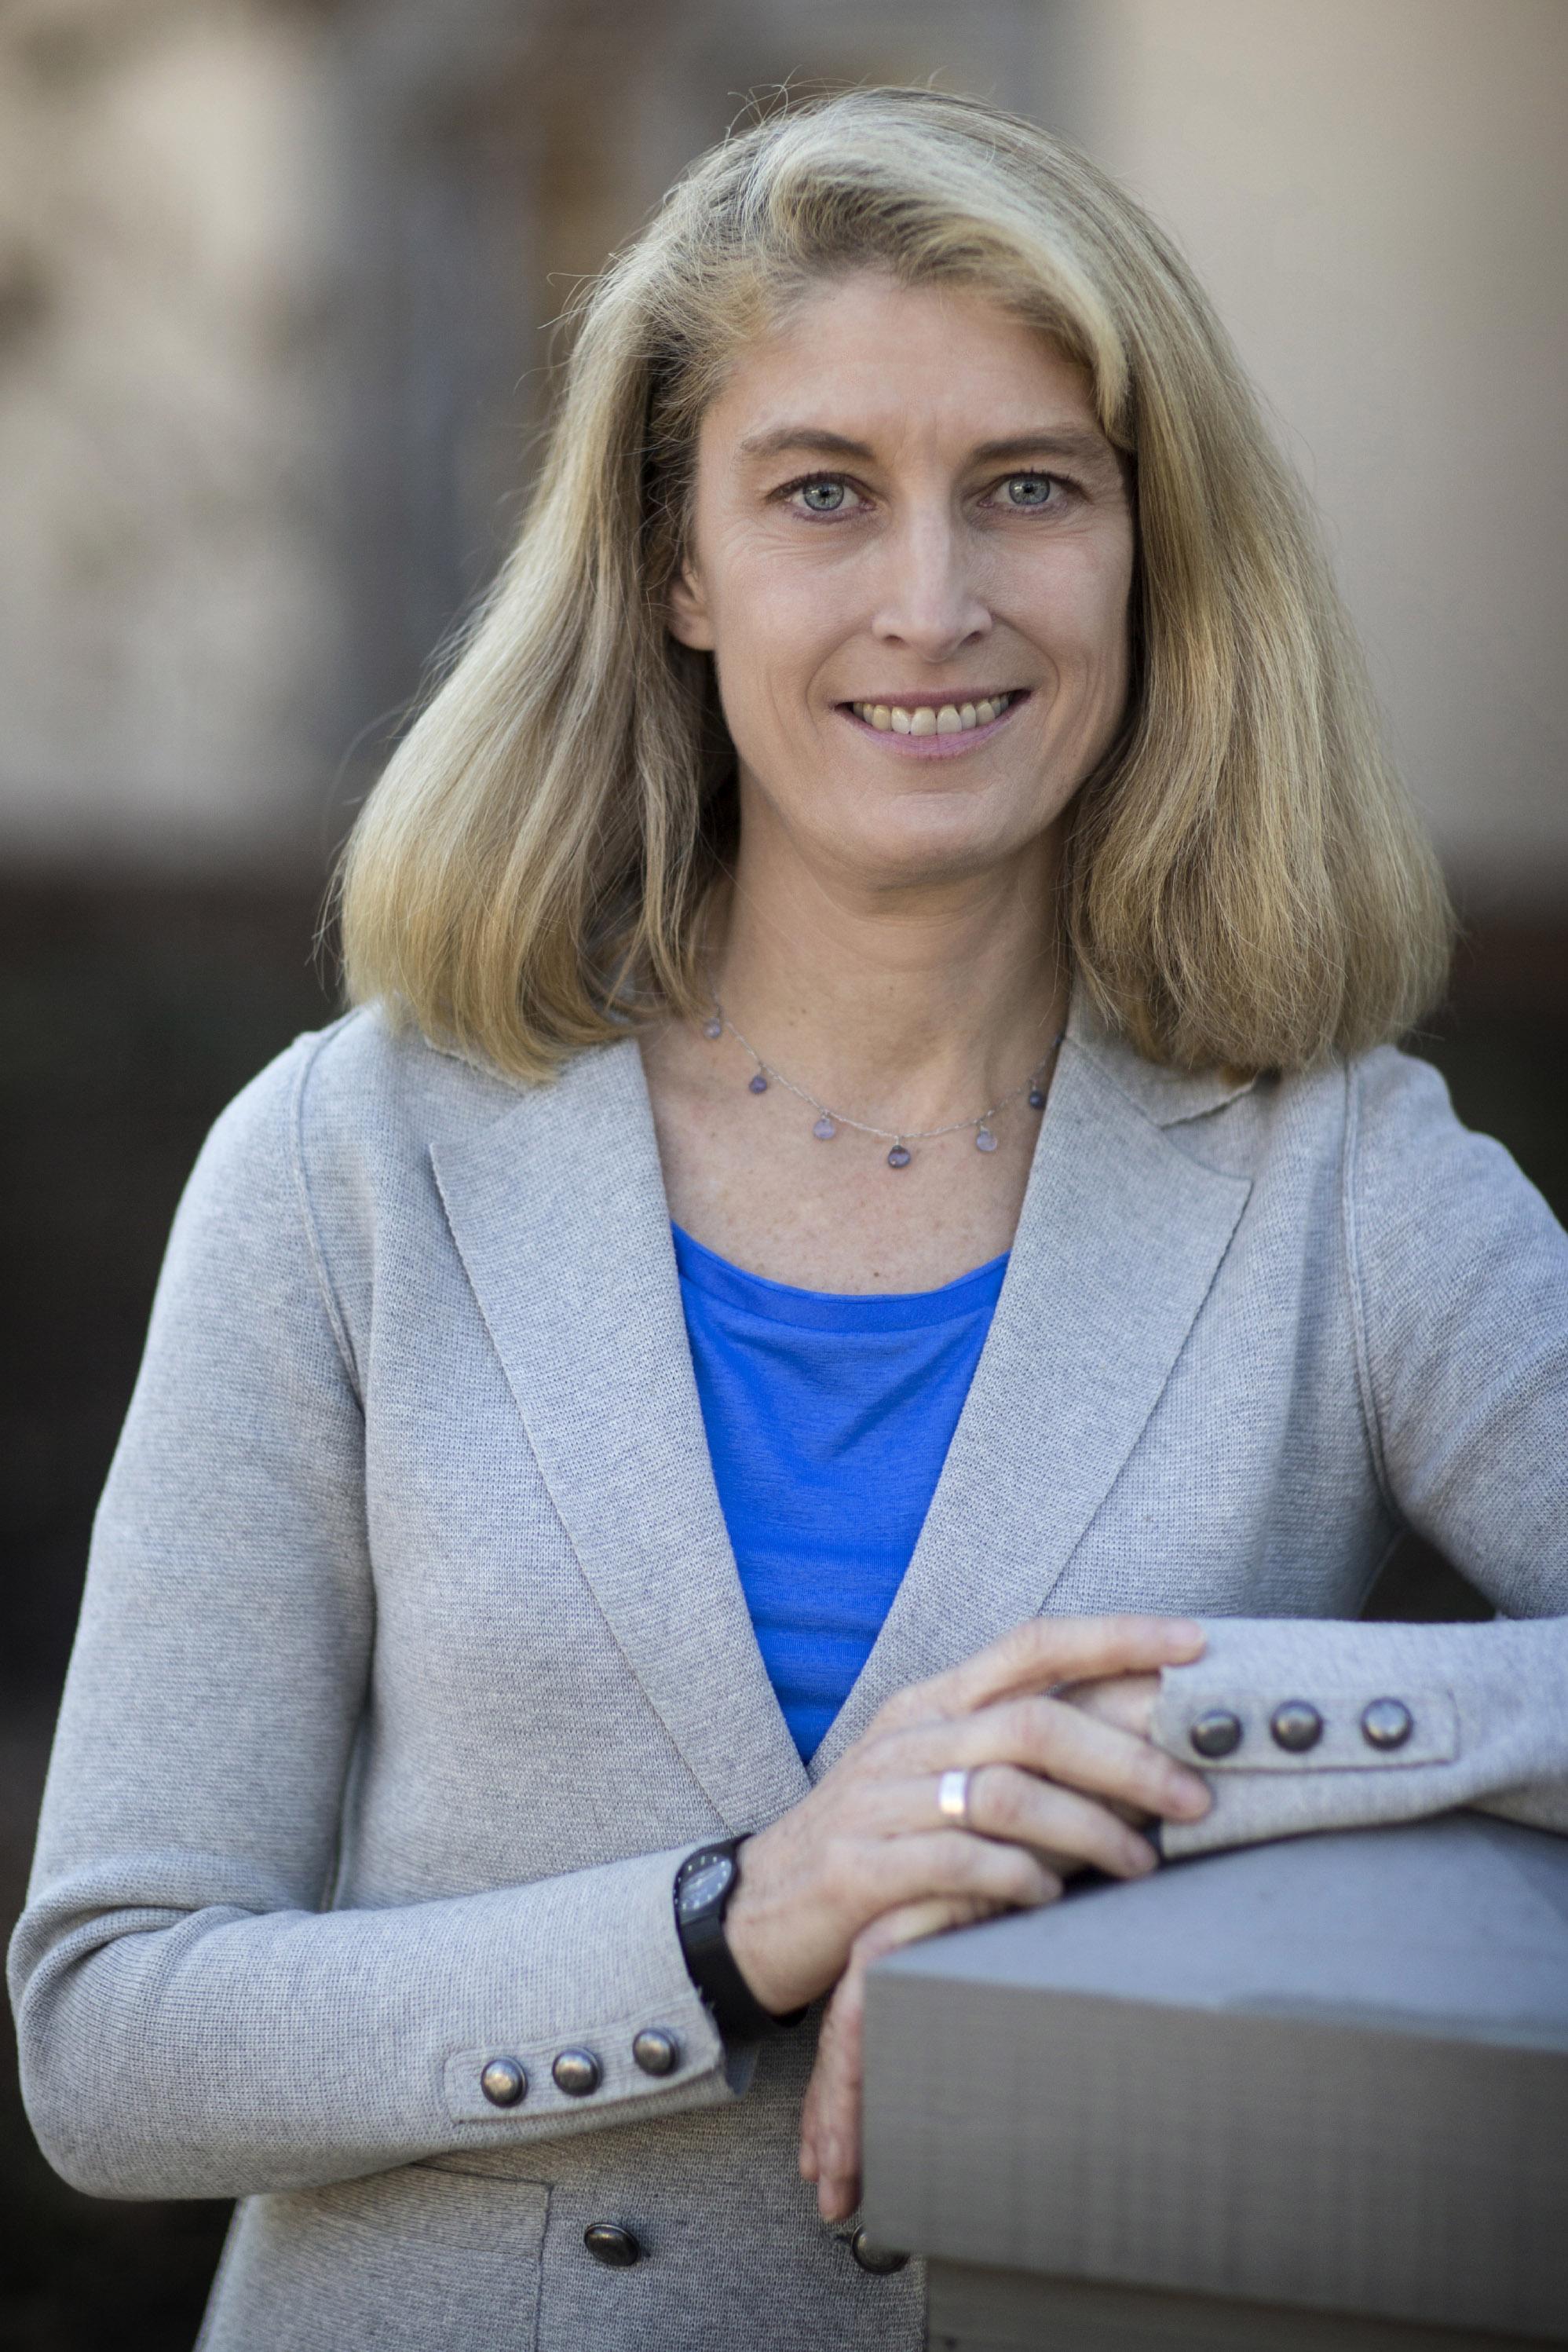 UVA environmental scientist Karen McGlathery